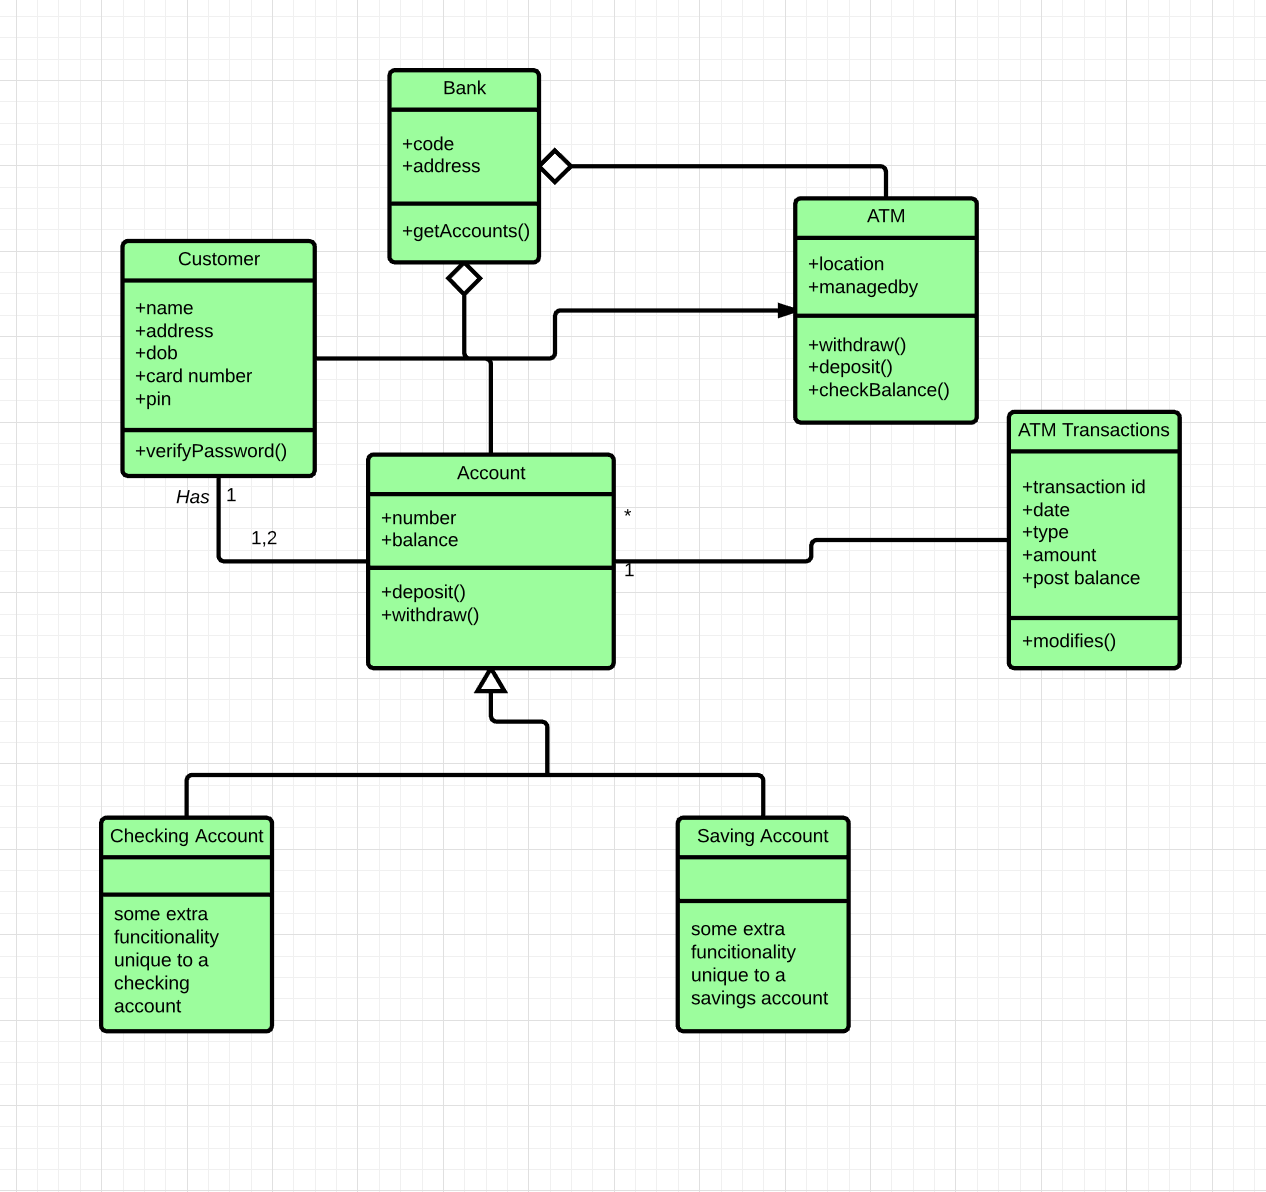 class system diagram ceiling fan speed control wiring uml example  salma medium